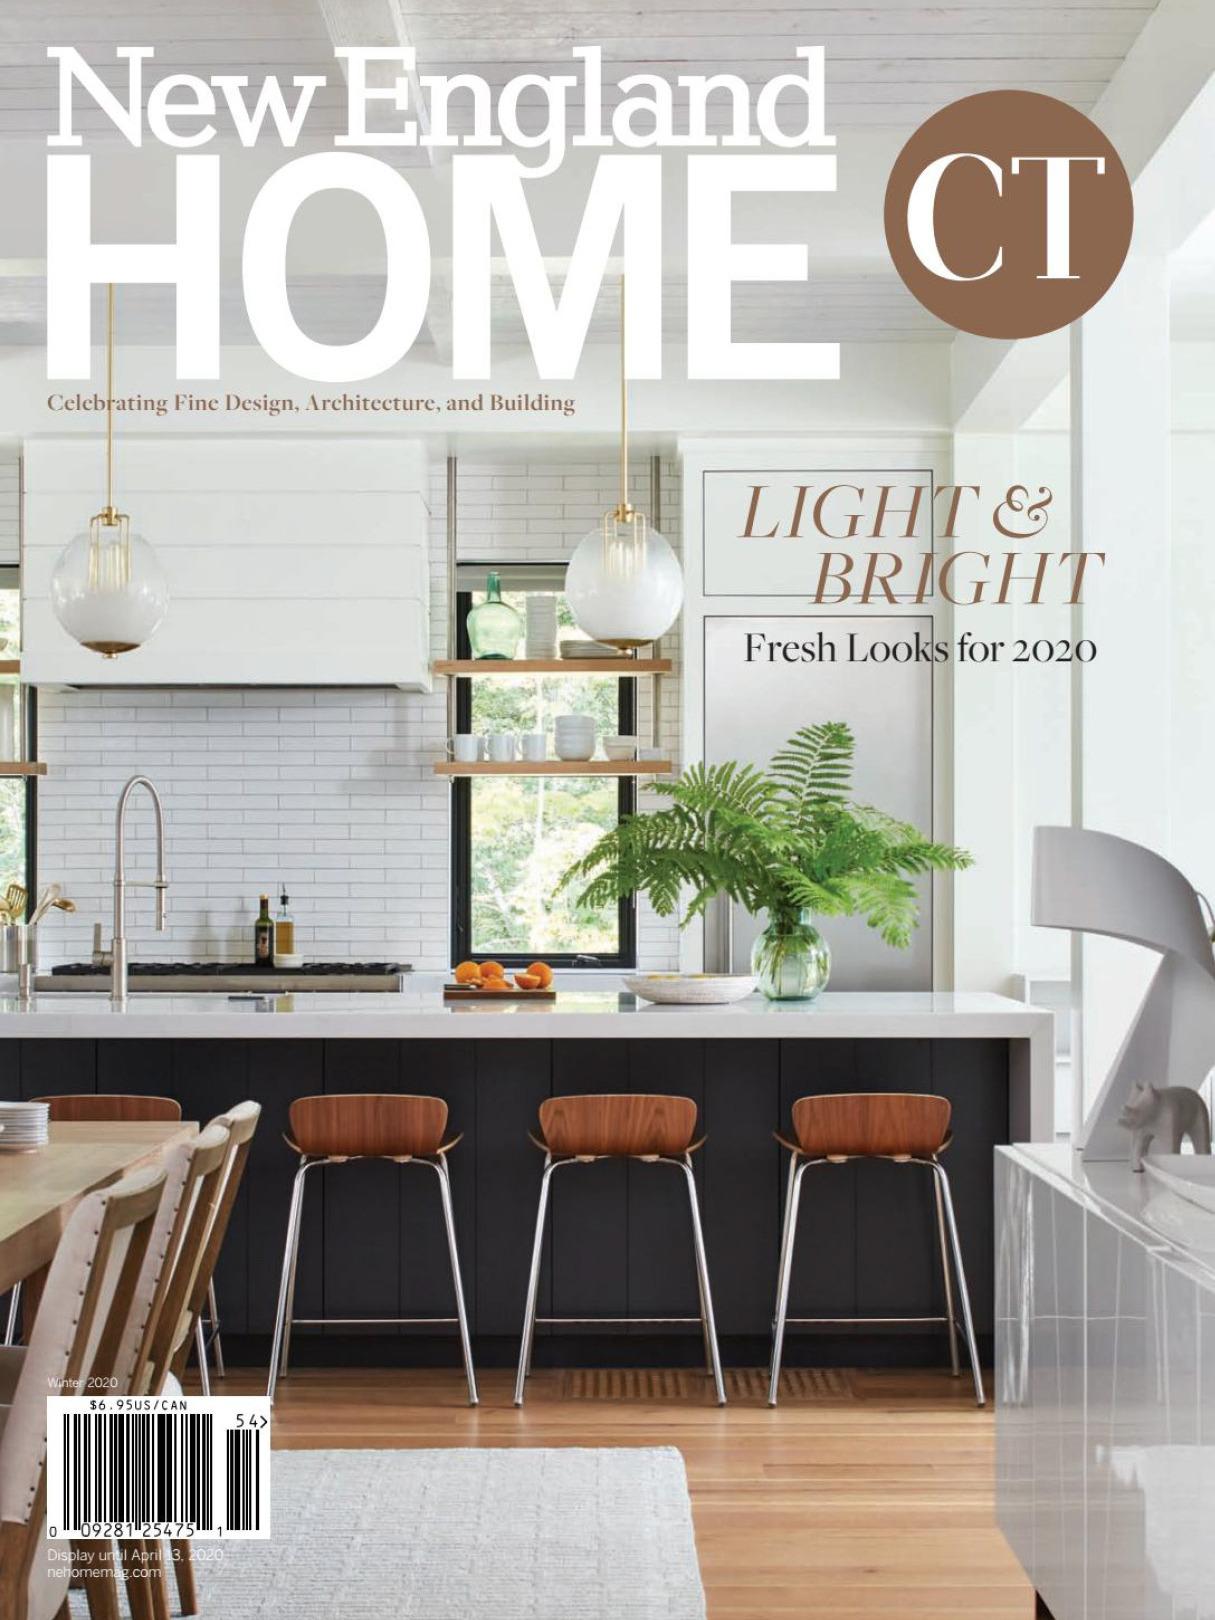 《New England Home》美国室内时尚杂志2020年冬季号